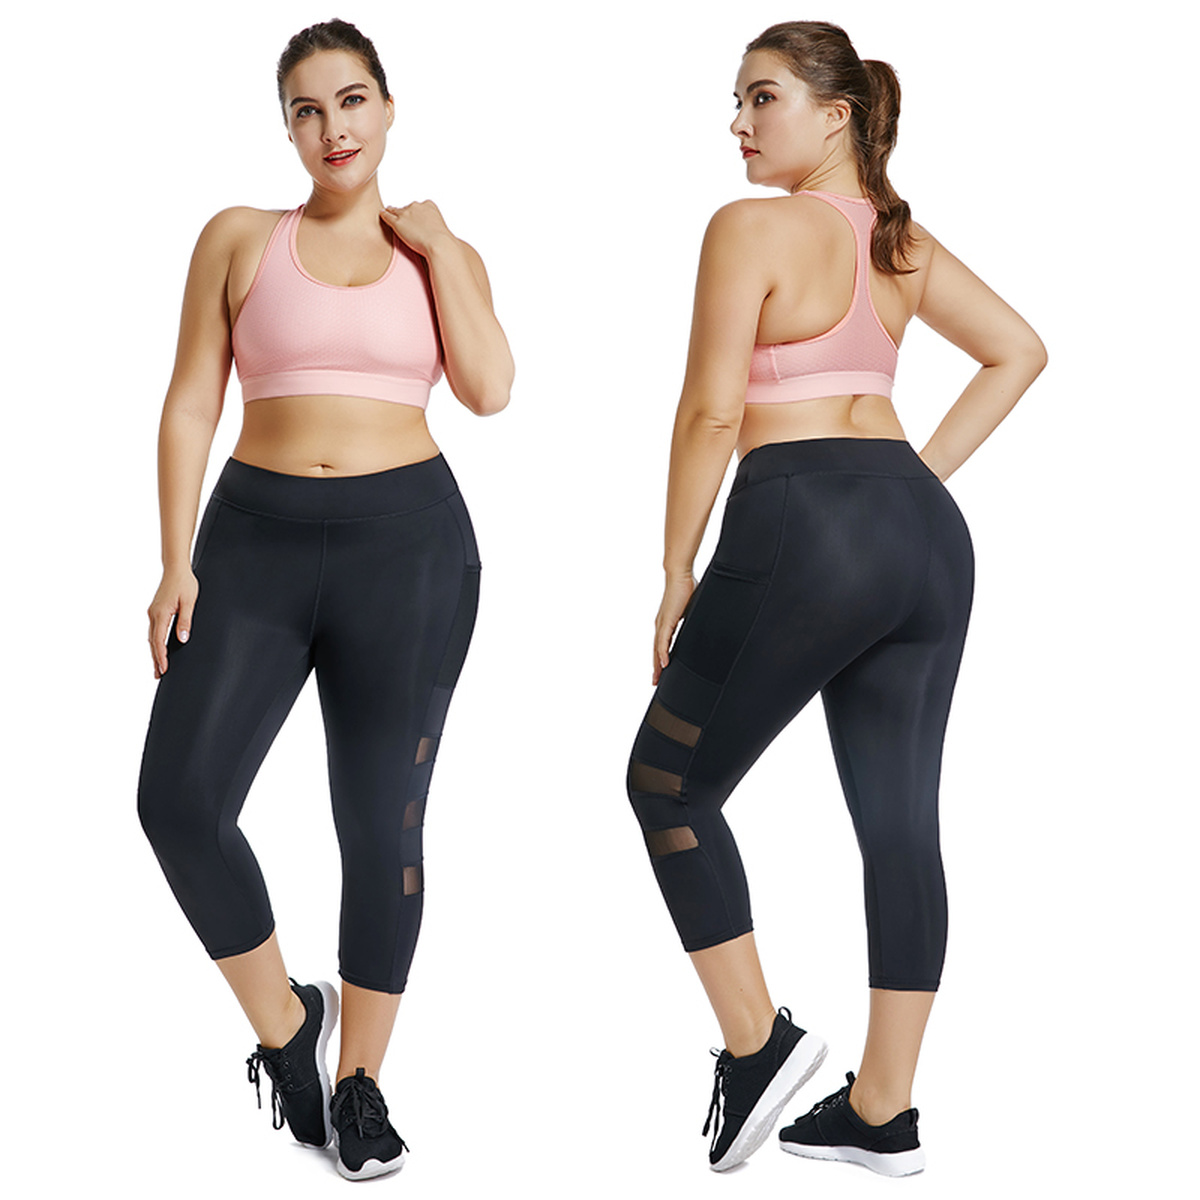 Joyshaper Plus Size Well Fitting Women Capri Workout Leggings With Pockets Breathable Mesh Mid-Calf Gym Sport Pants Jeggings